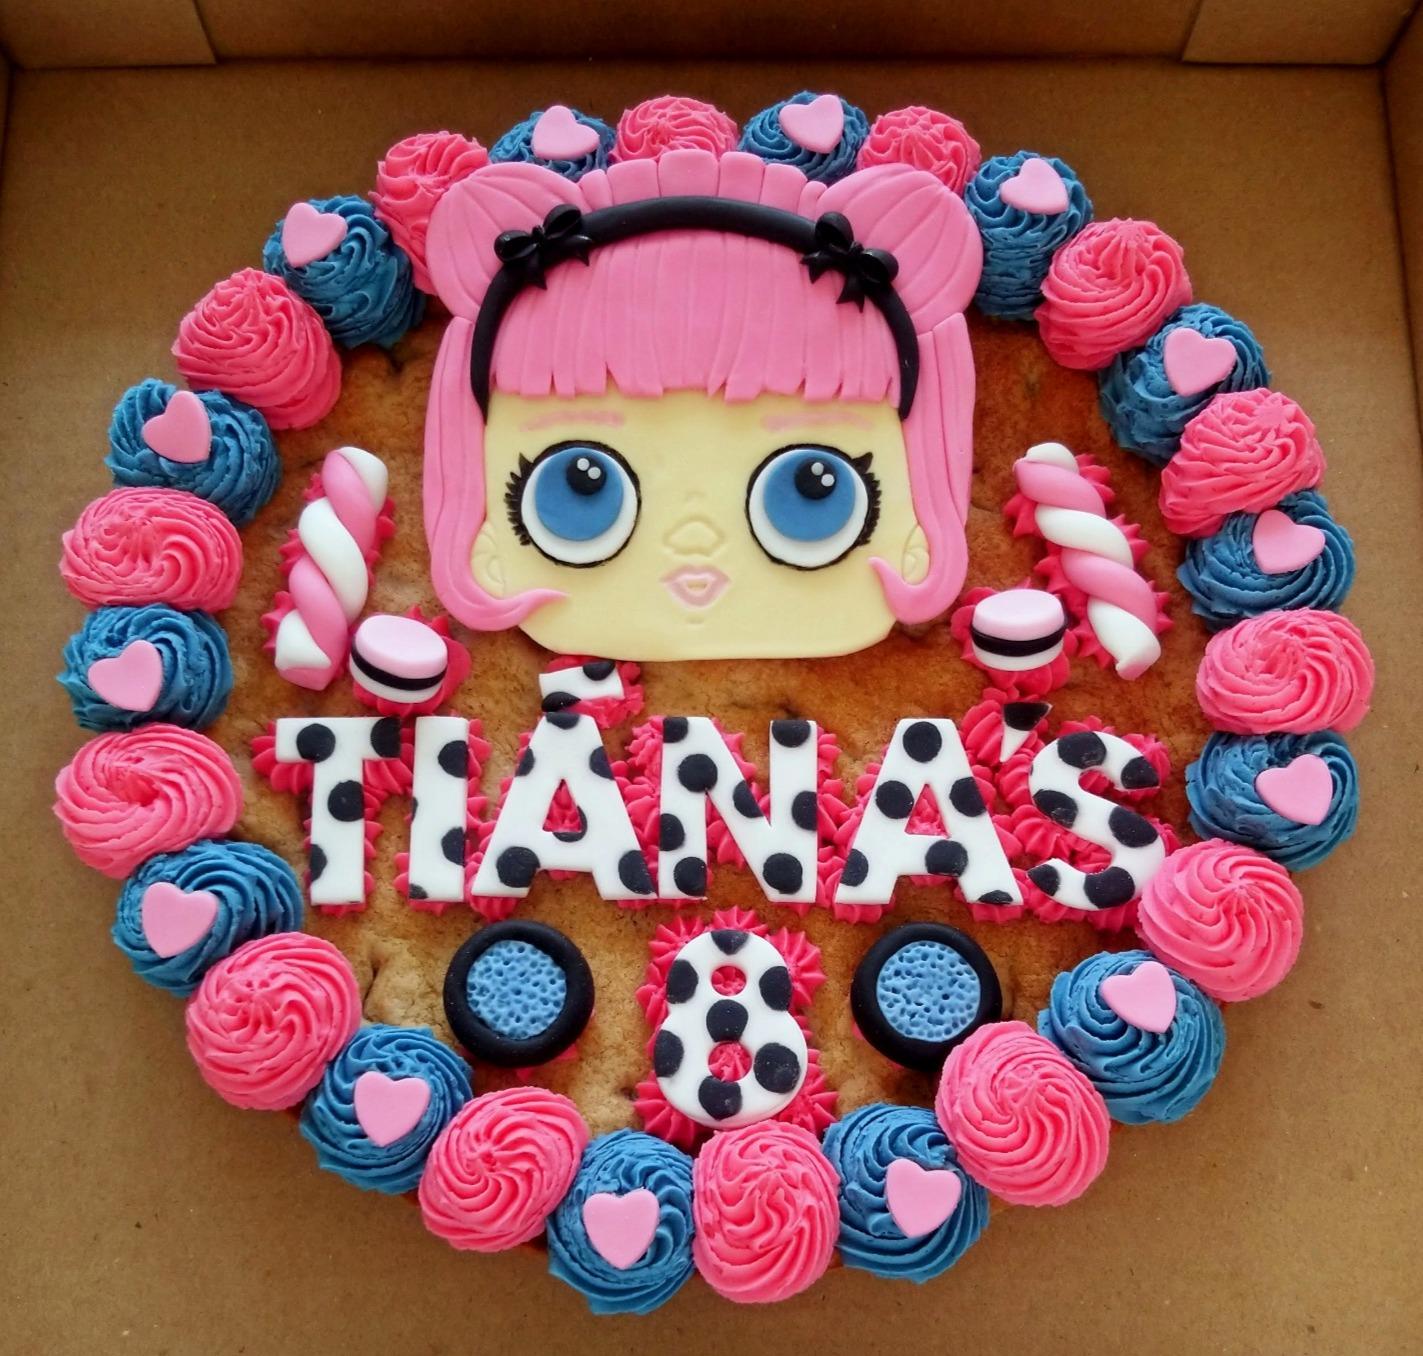 LOL Dolls Giant Cookie